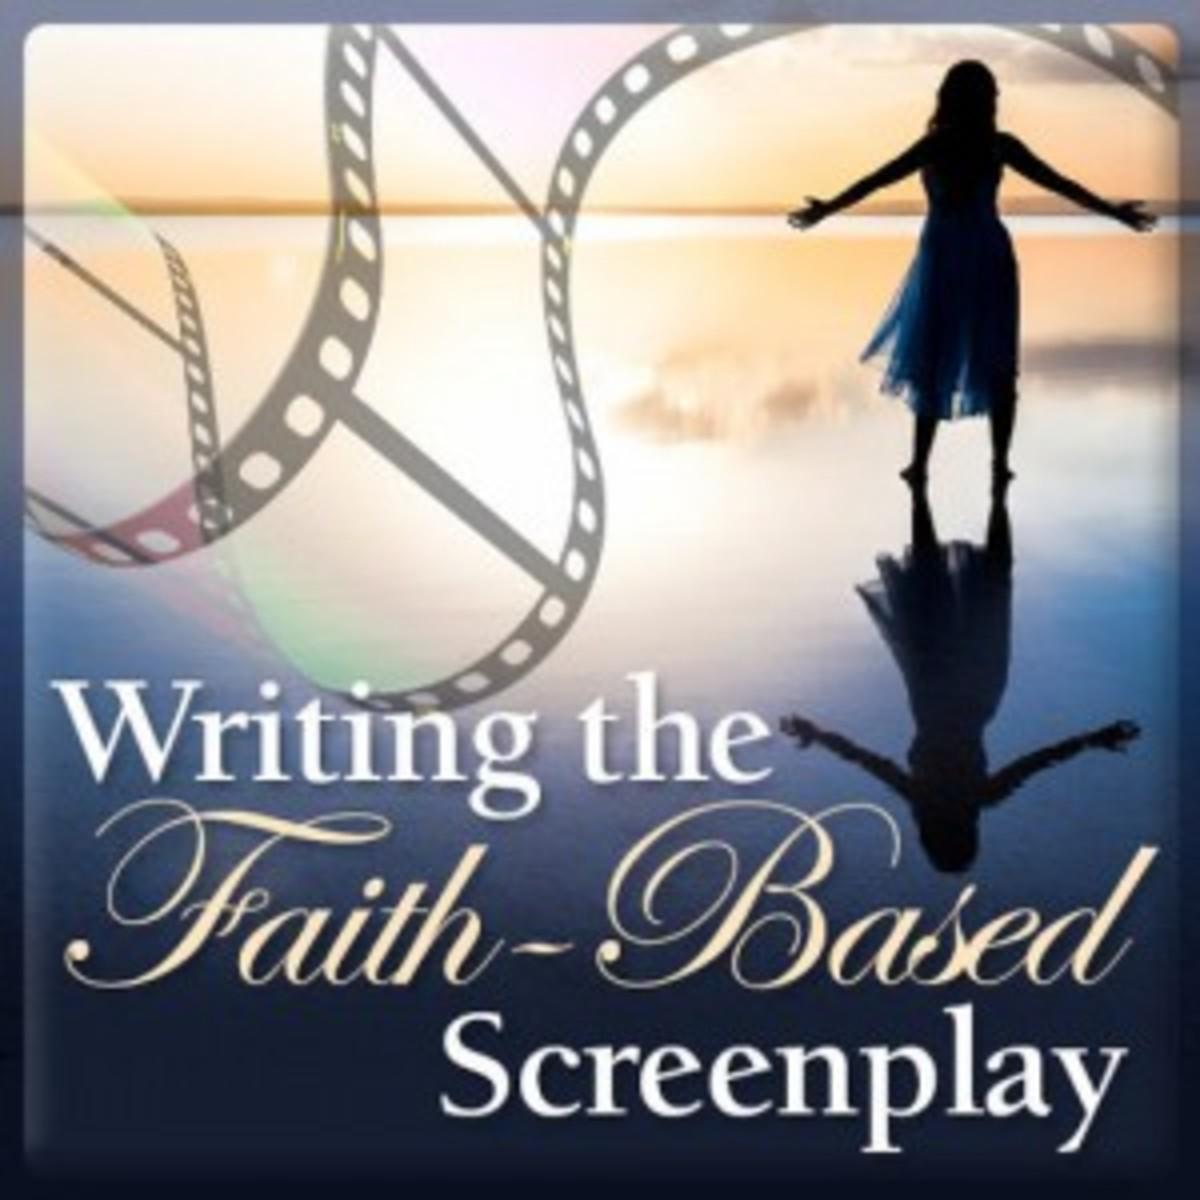 ws_faithbasedscreenplay-500_medium-1